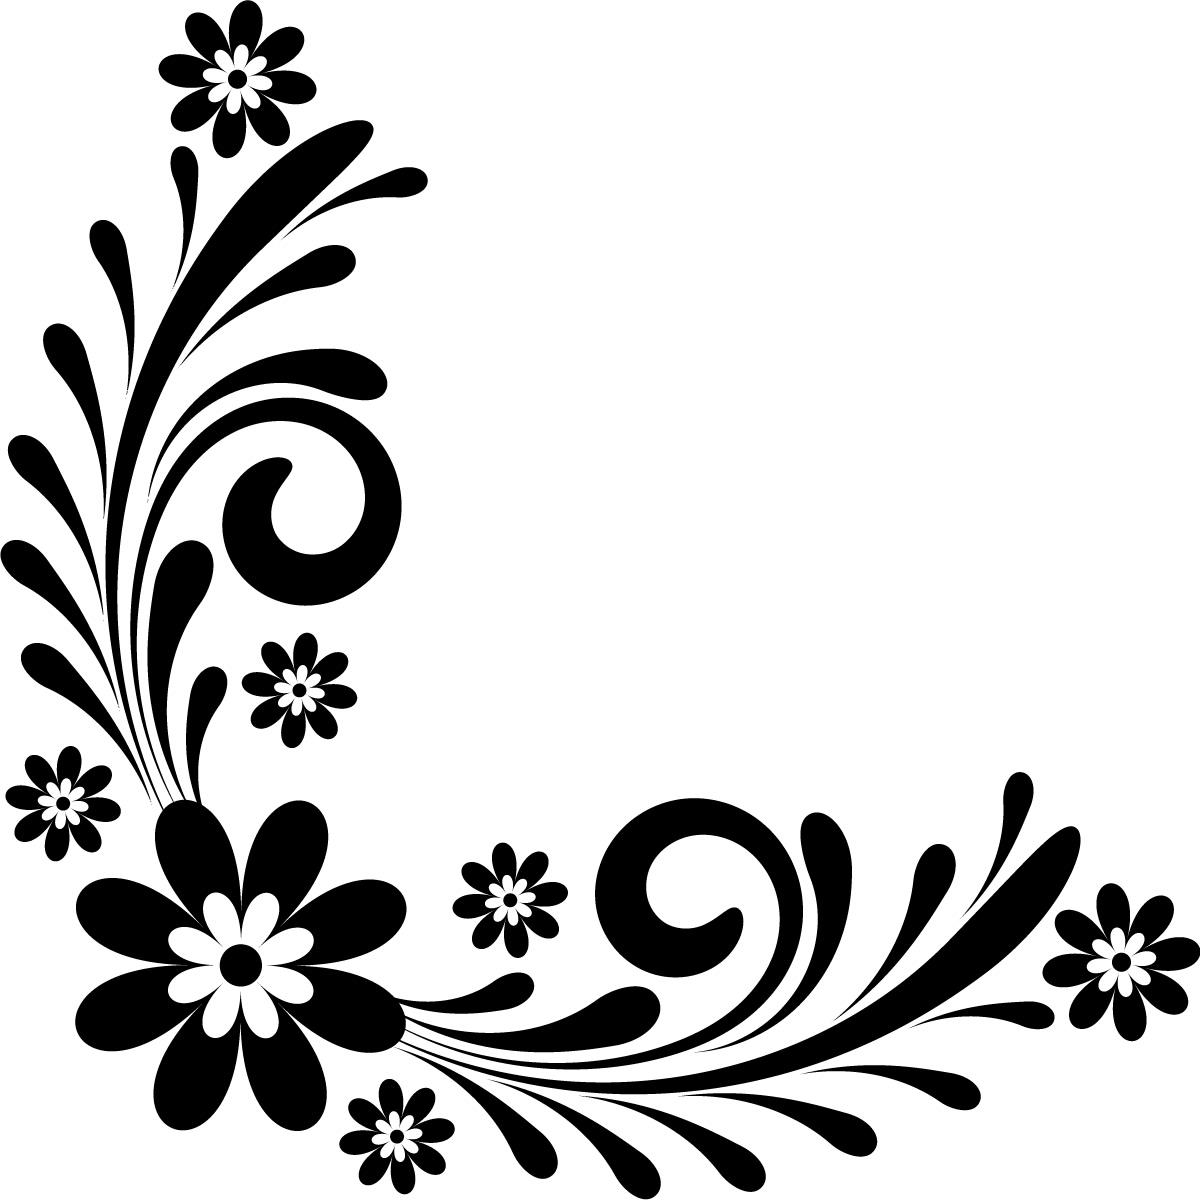 Border Design Black And White Clipart